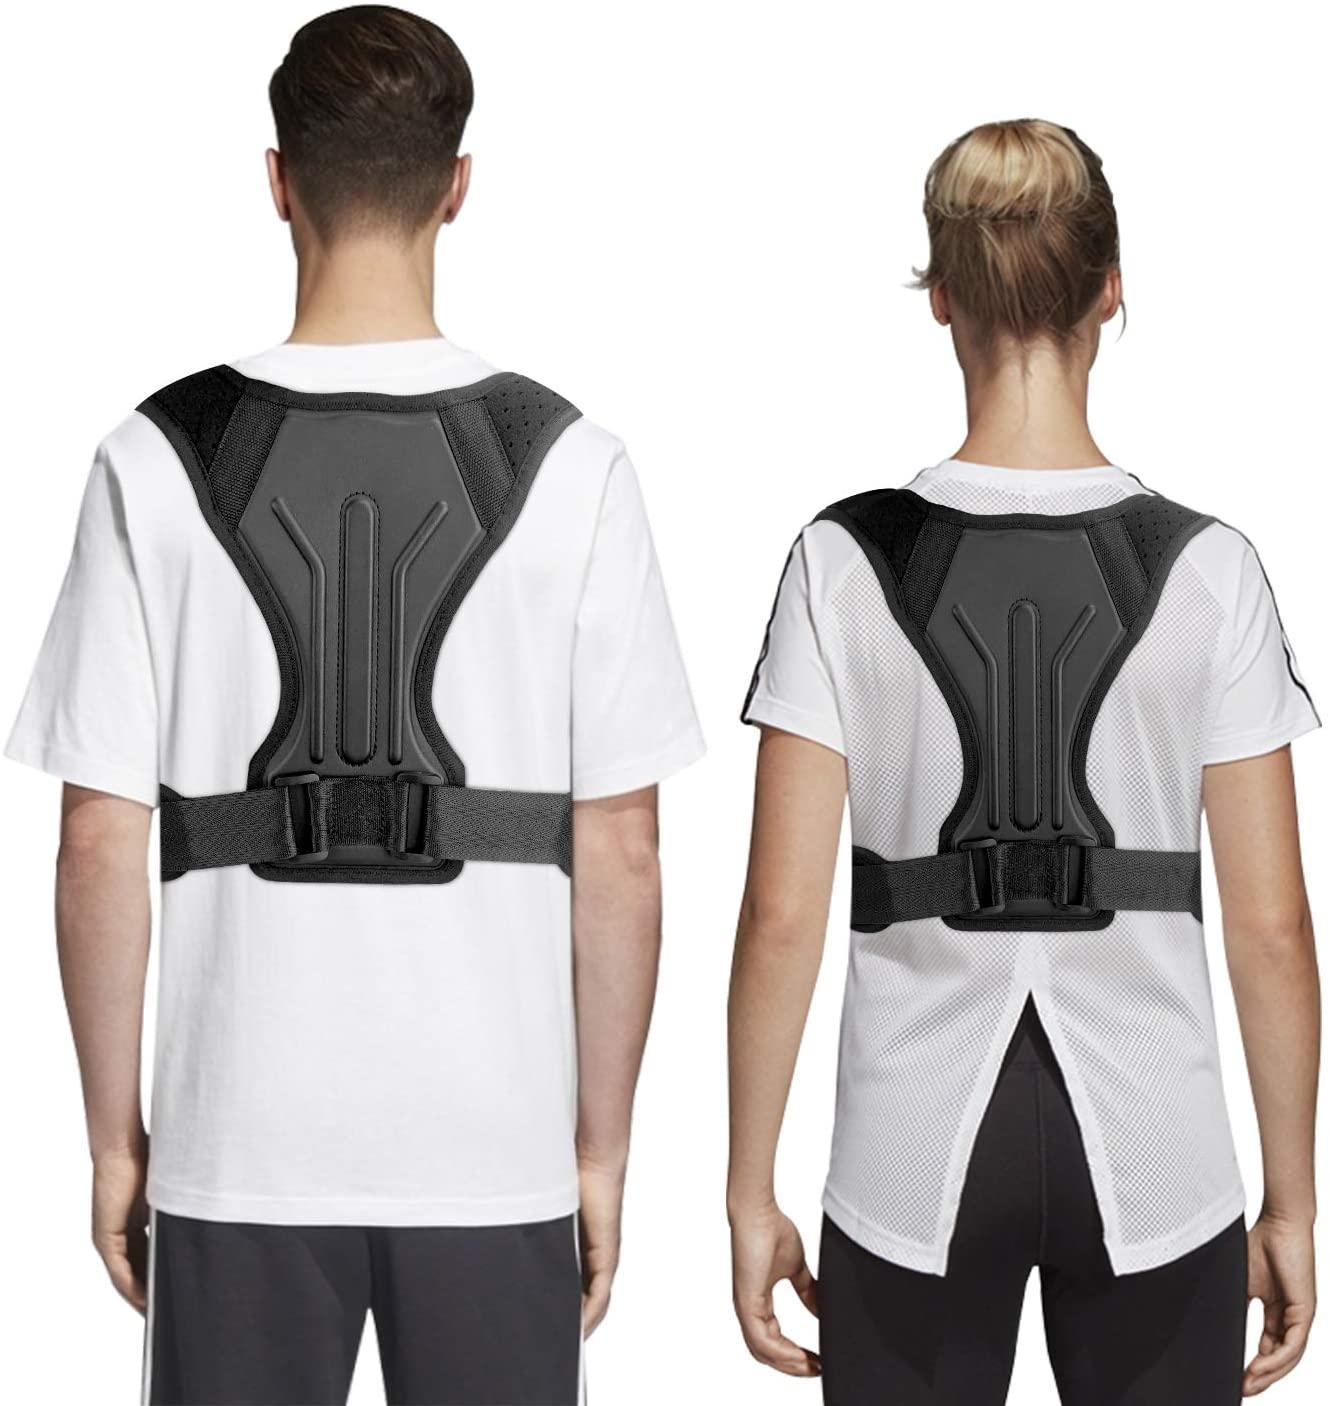 BFASU Fully-Adjustable Posture Corrector for Better Posture, Upper-Back, Neck and Shoulder Pains-Relief, Back-Straightener Support Brace for Men and Women, Black, S- XL